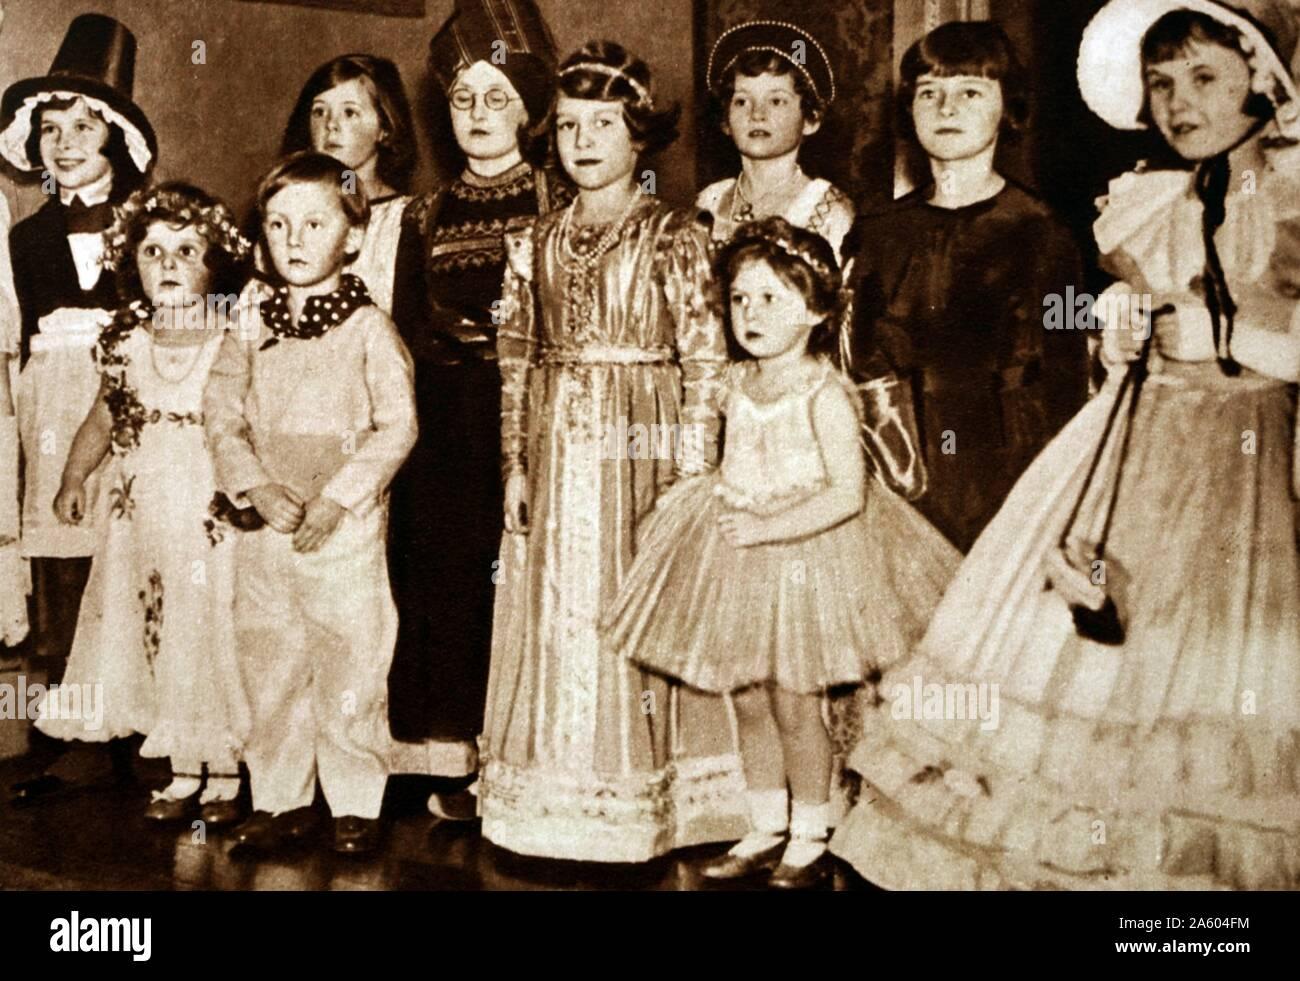 Photograph Of Young Princess Elizabeth 1926 Princess Margaret